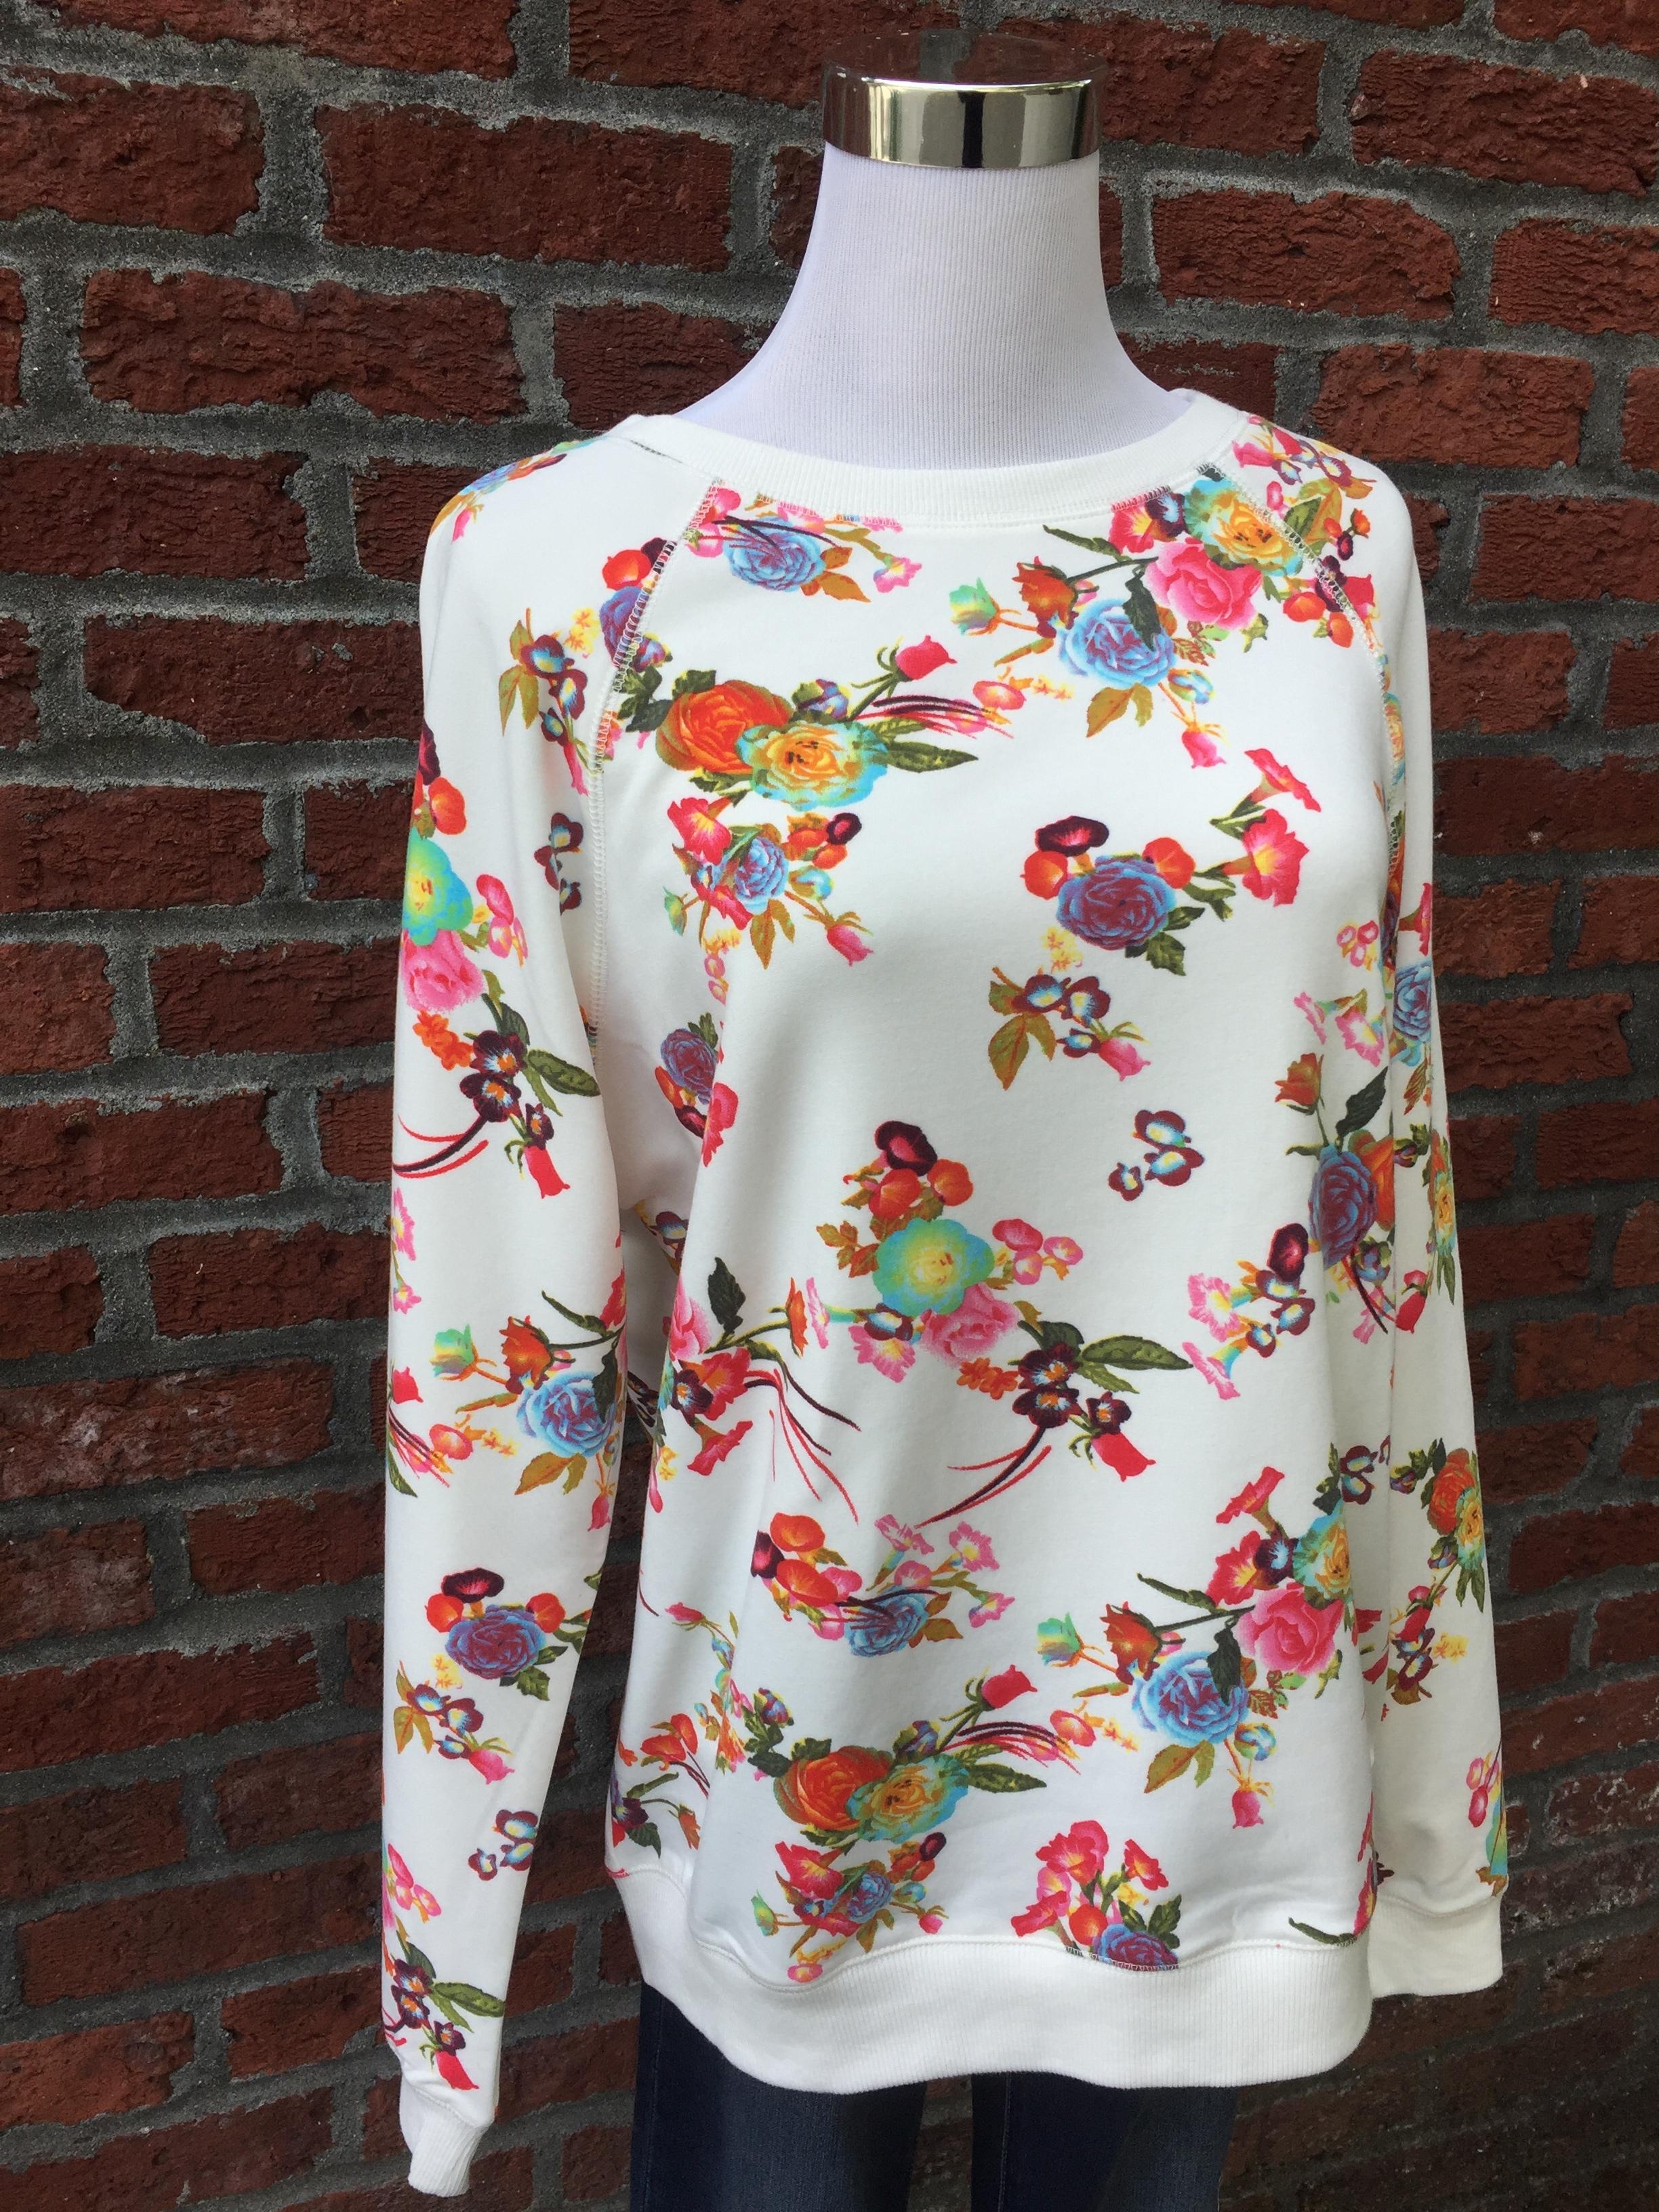 Hailey & Co floral sweatshirt ($42)